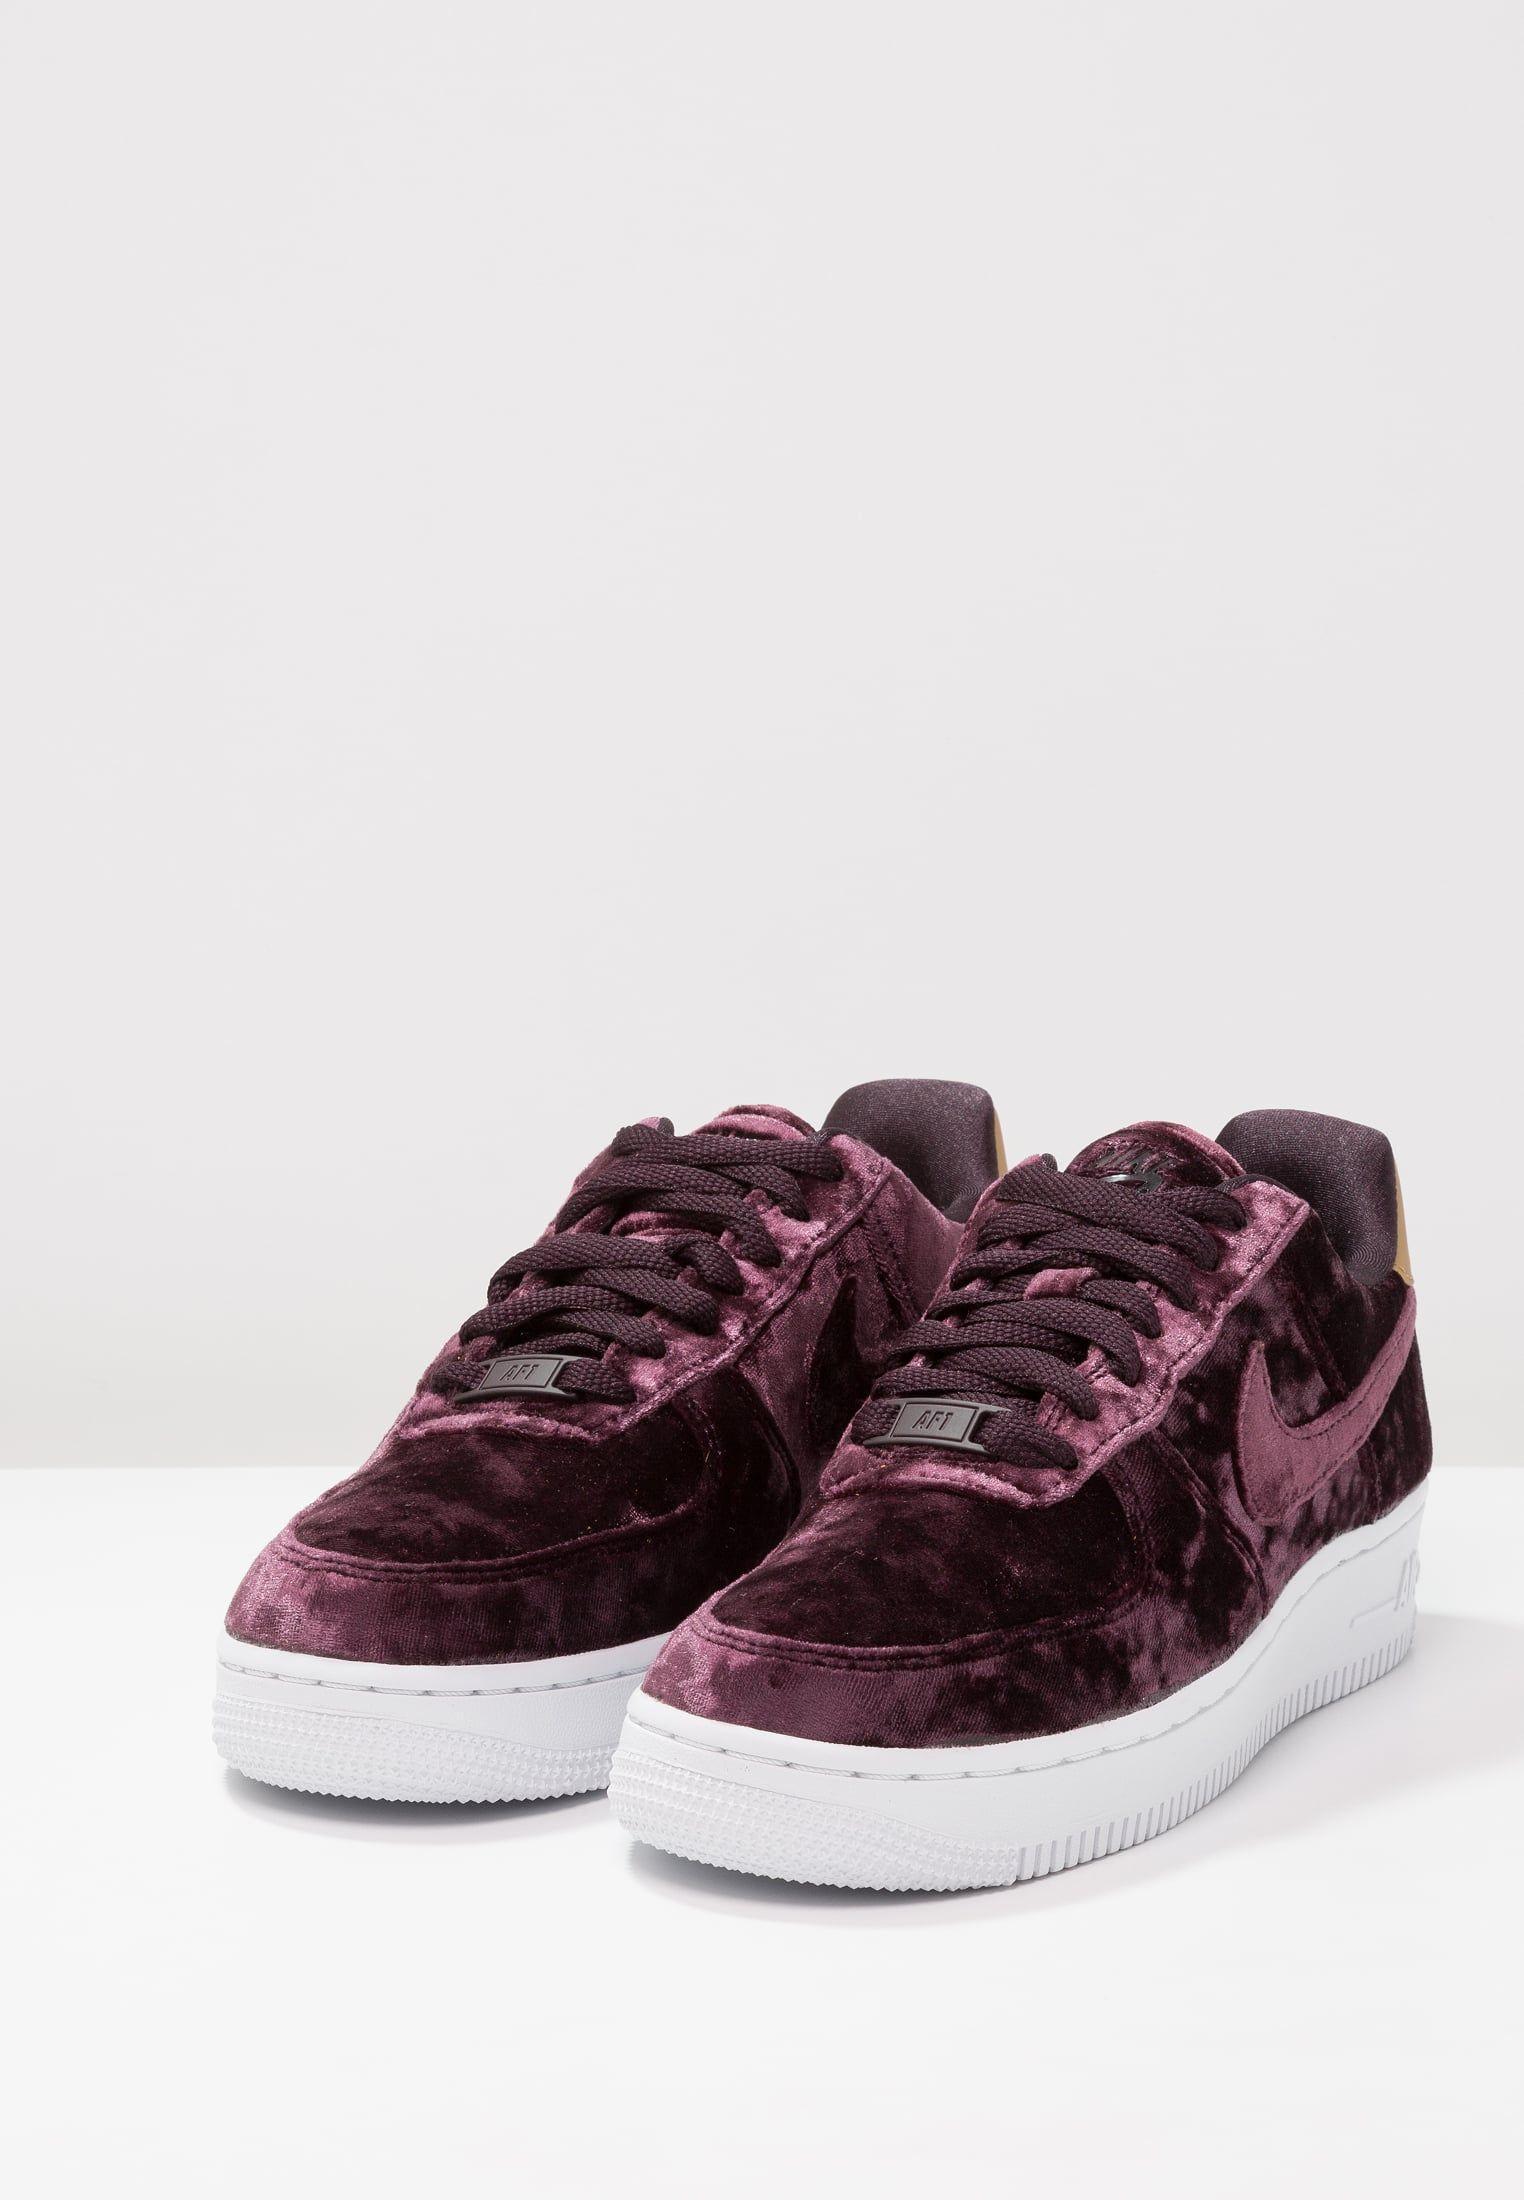 cc7dbd36c5f4 Chaussures Nike Sportswear AIR FORCE 1 07 PRM - Baskets basses - port wine